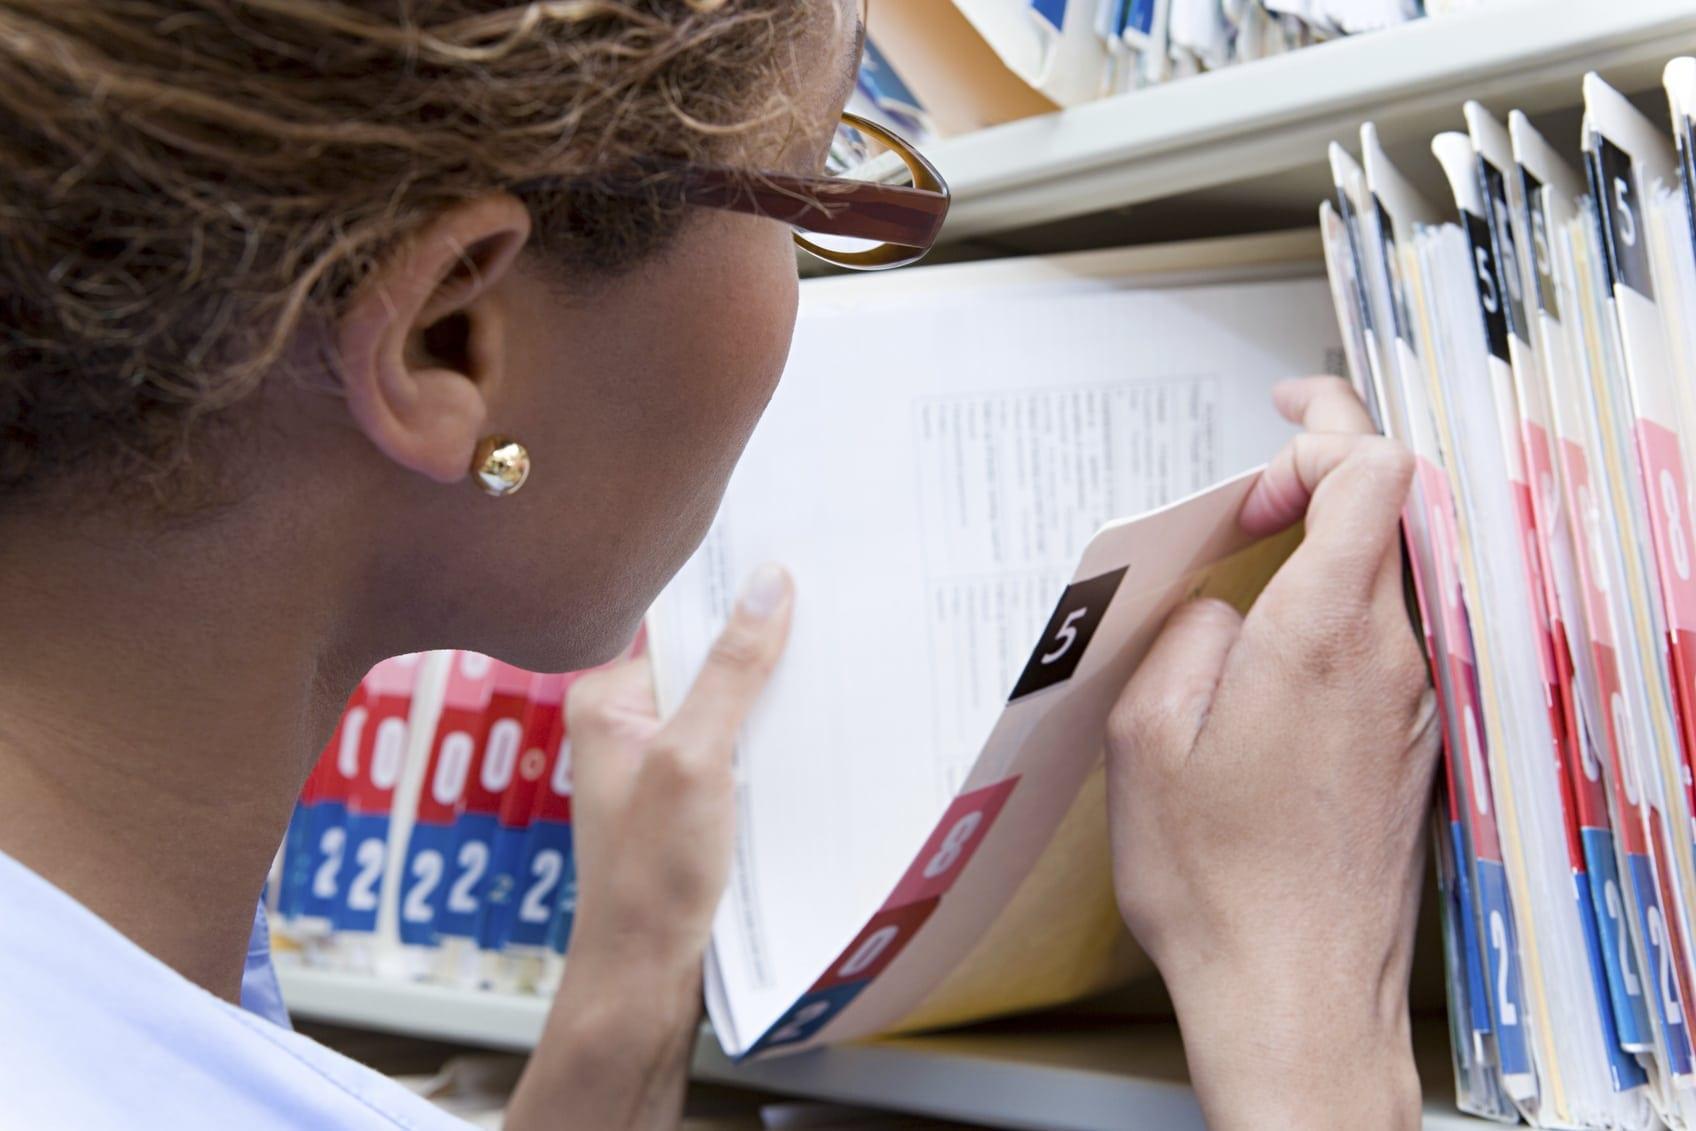 Nurse Examining Medical Records On Shelf Stock Photo